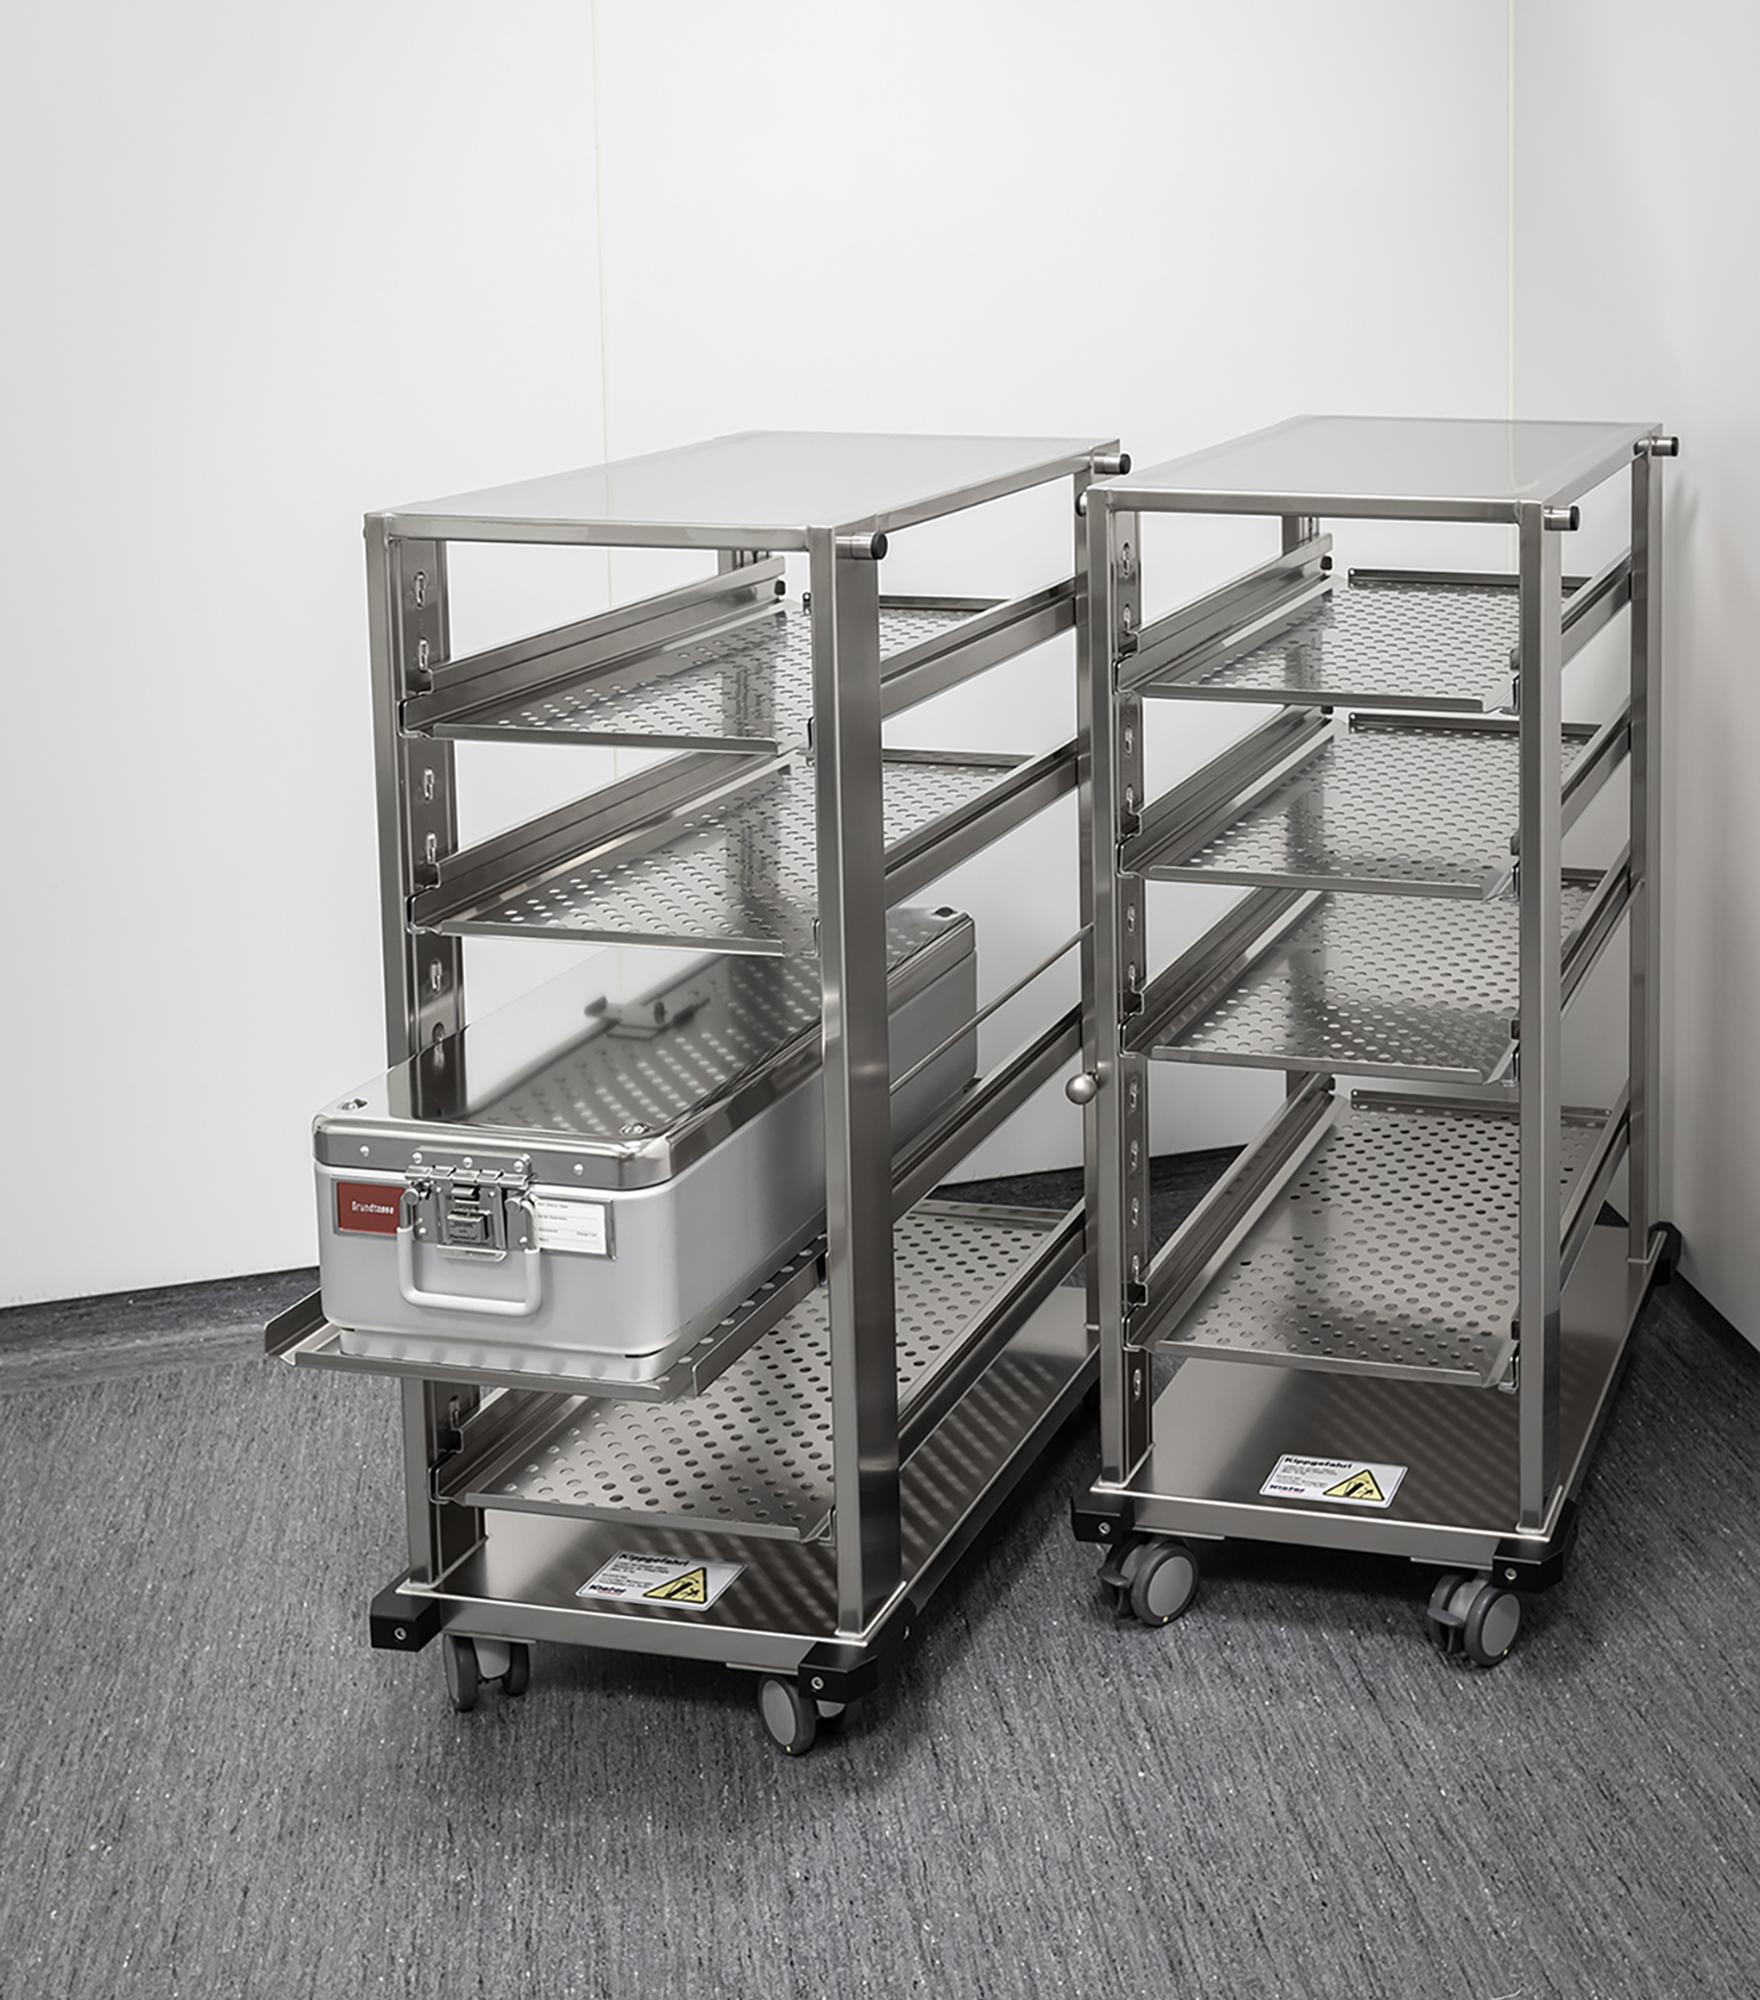 Reinraum-Transportmobiliar von Kiefer technic